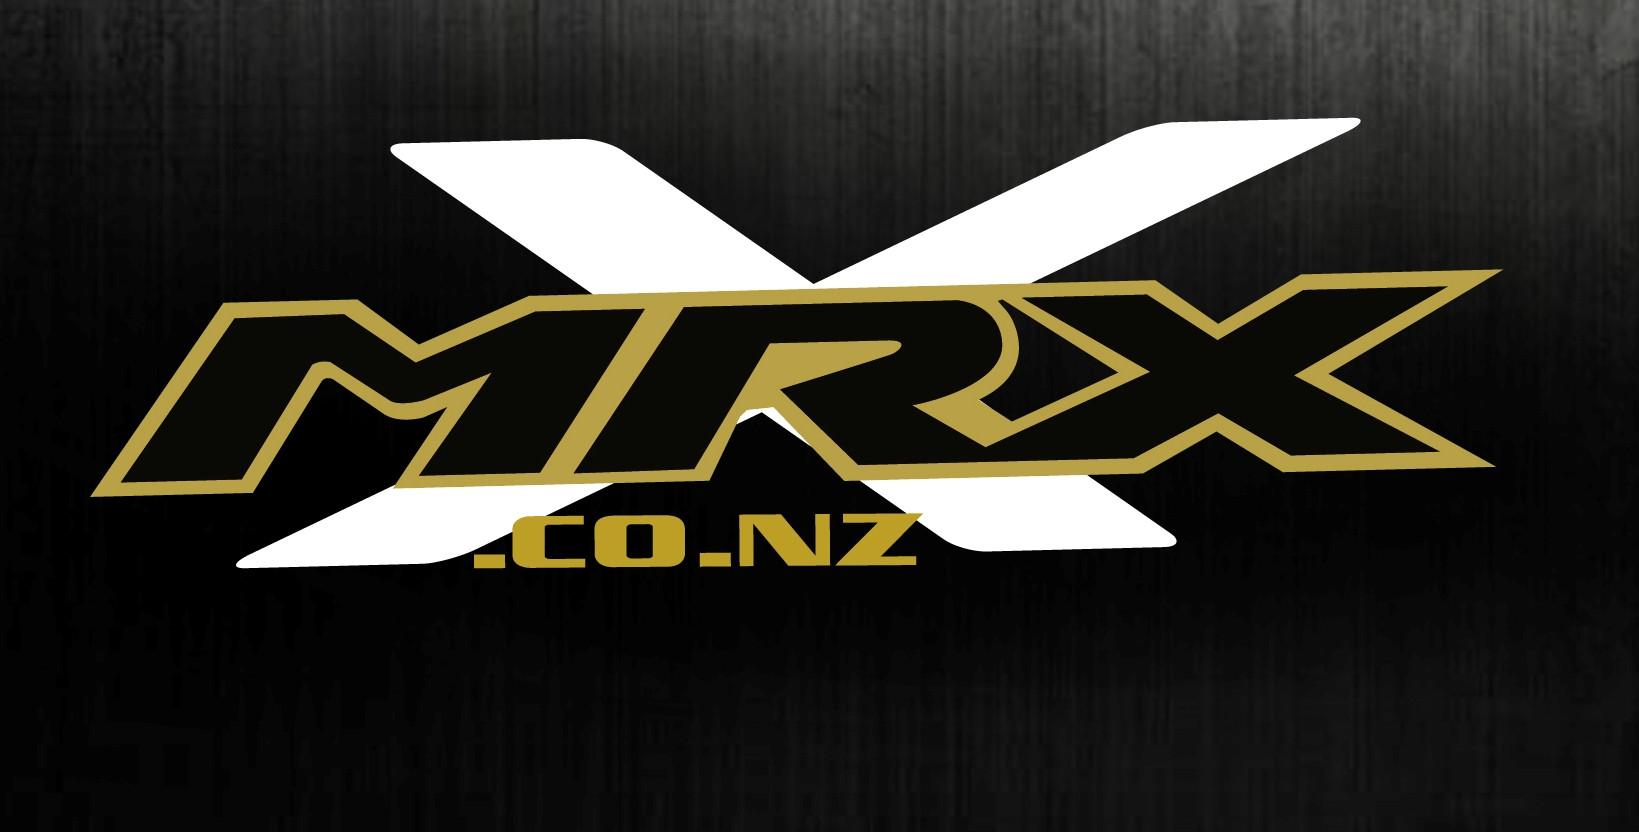 www.mrx.co.nz